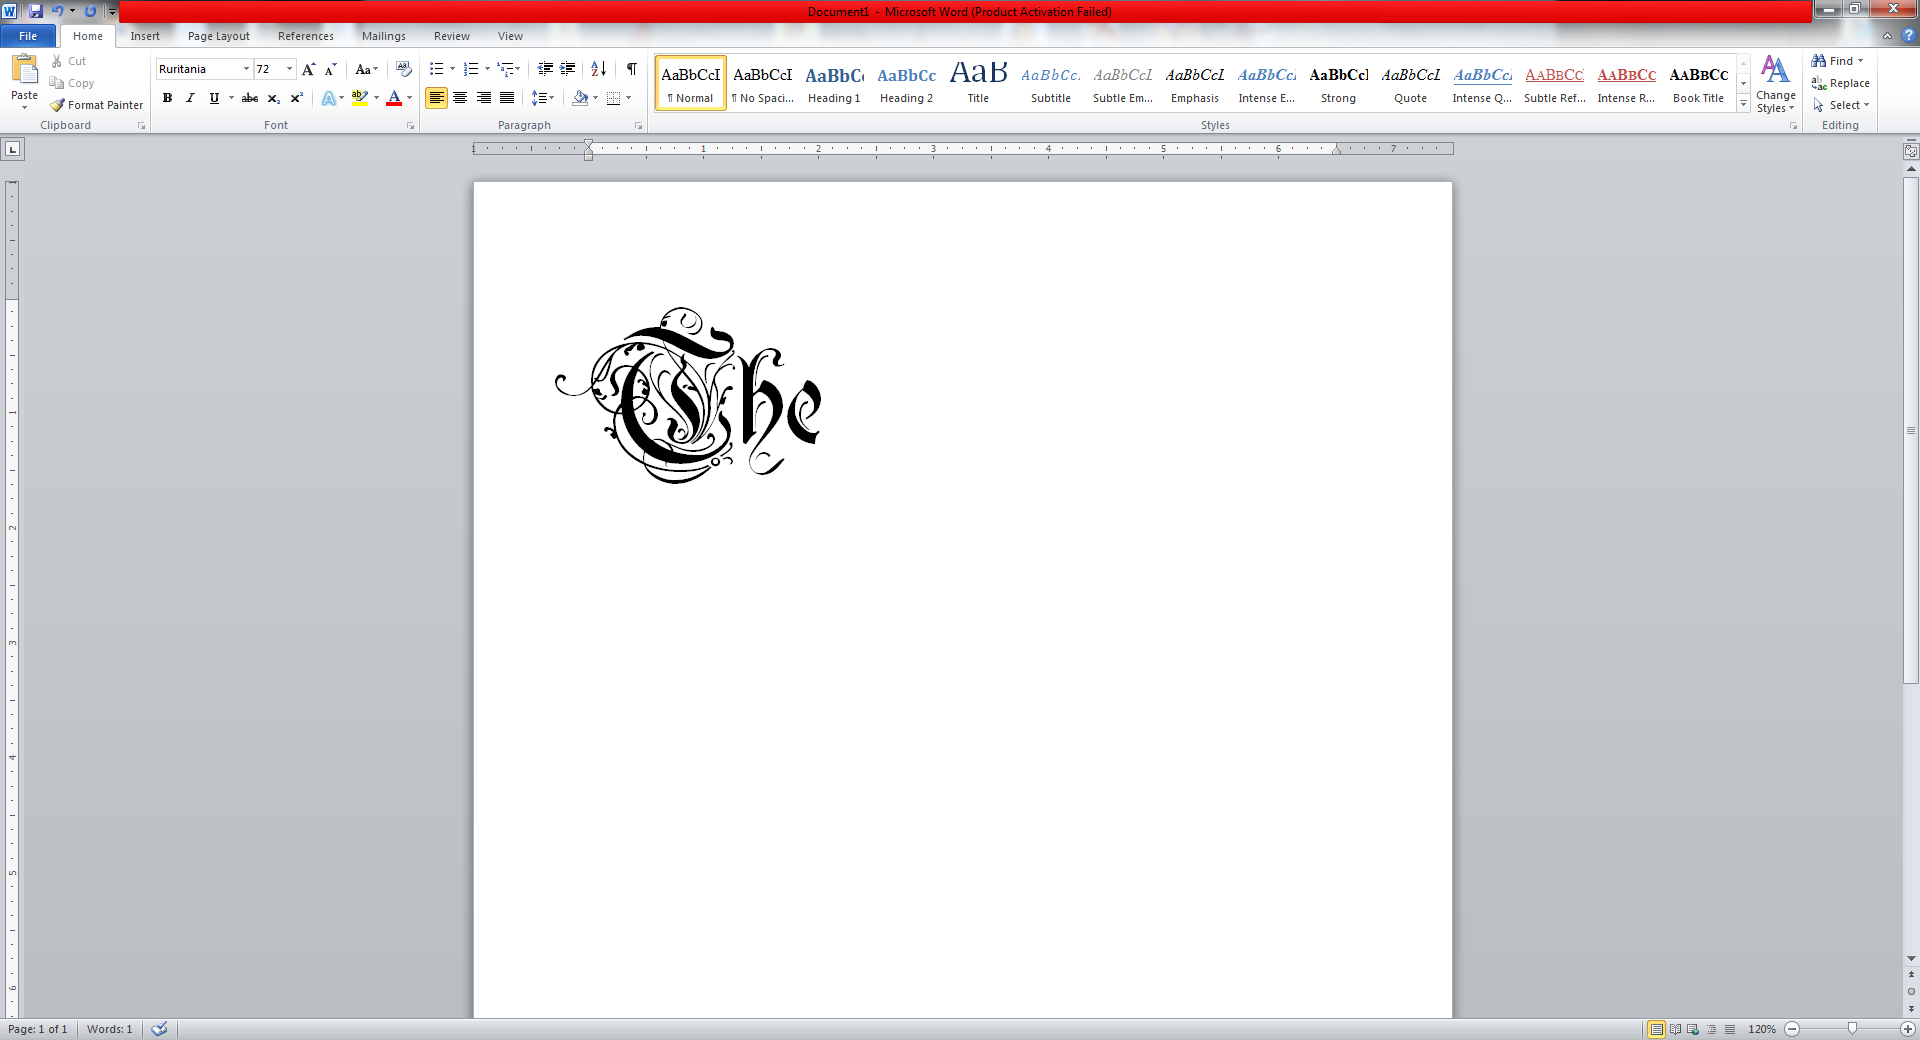 002 Hzypirh Essay Example Spongebob The Top Font Name Copy And Paste Full